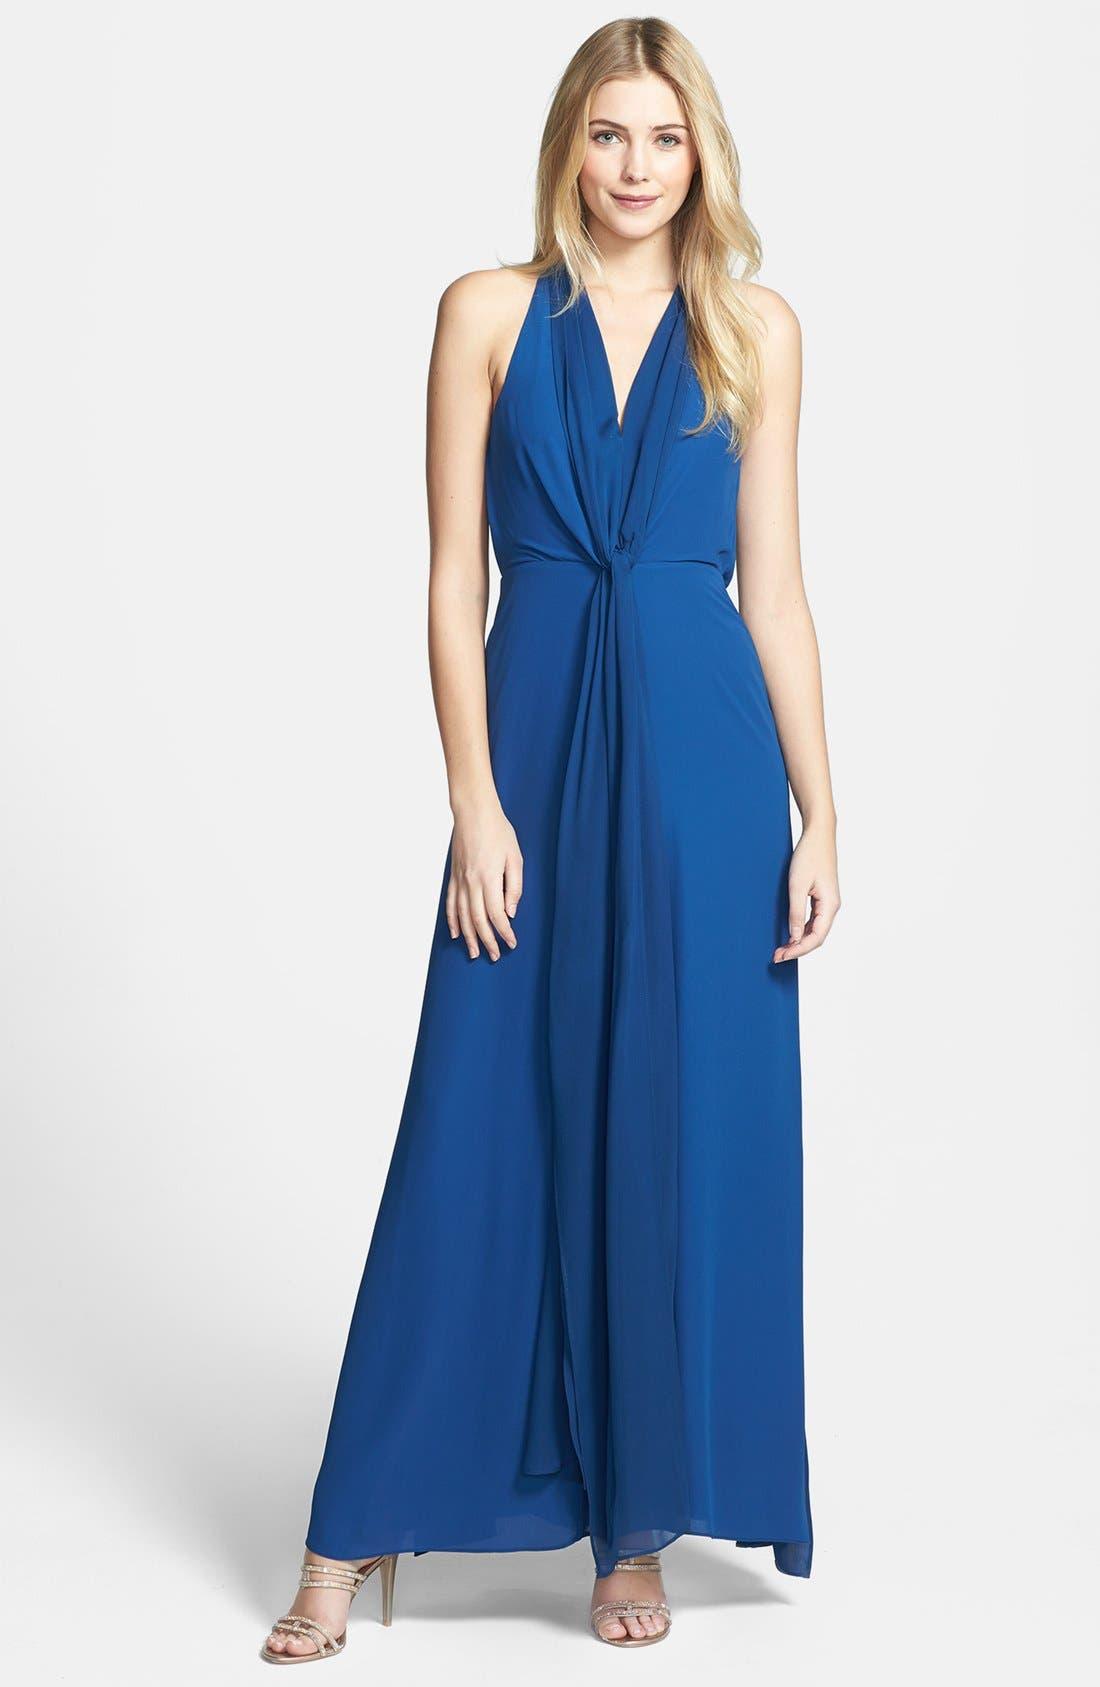 Alternate Image 1 Selected - BCBGMAXAZRIA 'Mara' Halter Gown